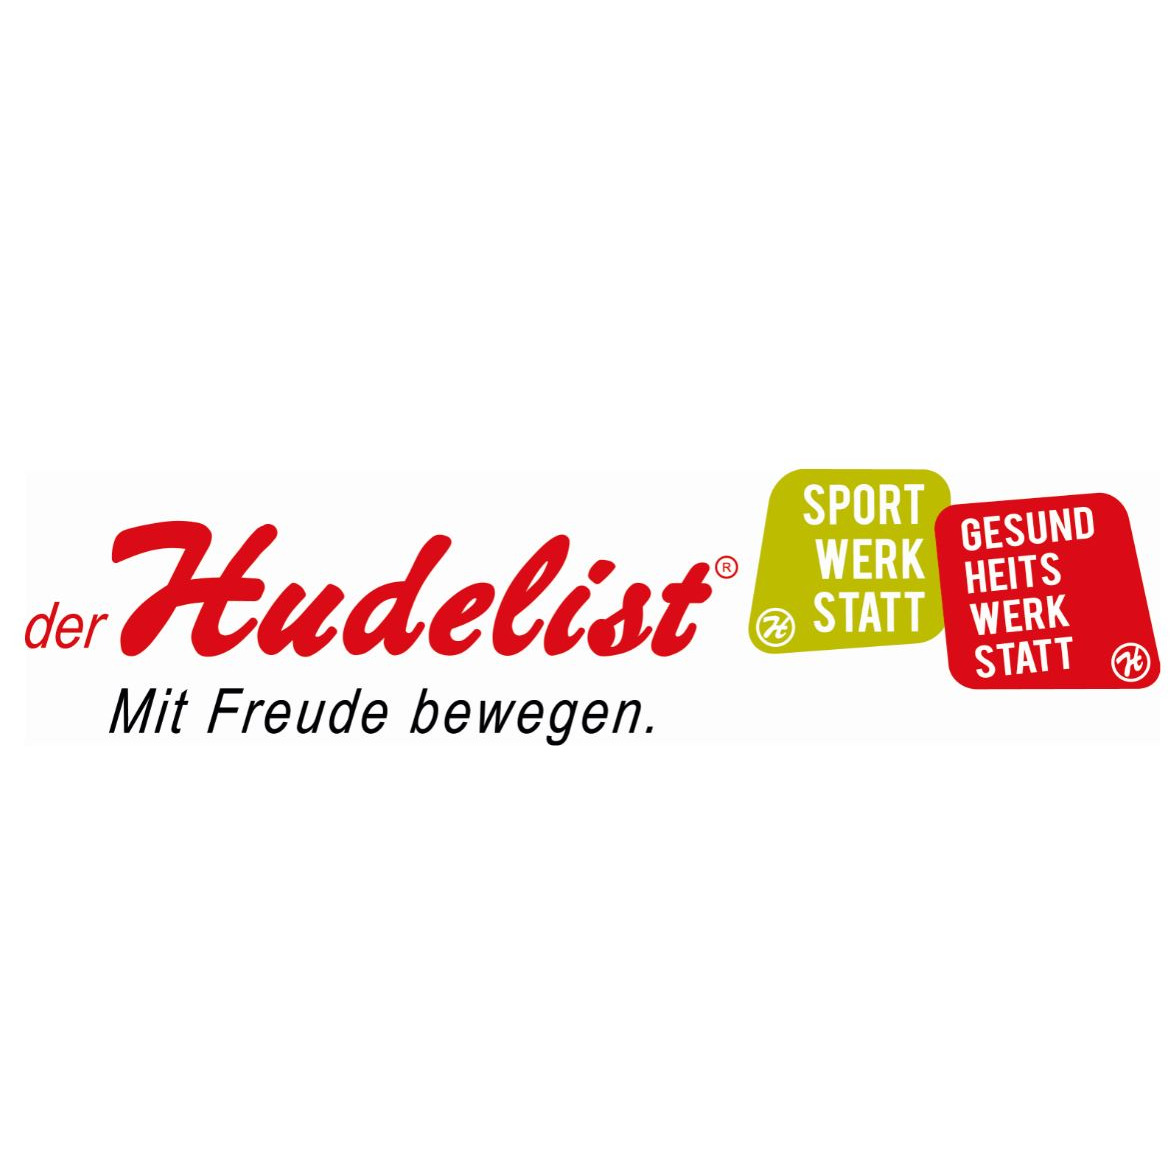 HUDELIST - Gesundheitswerkstatt & Sportwerkstatt - Orthopädietechnik  9020 Klagenfurt Logo